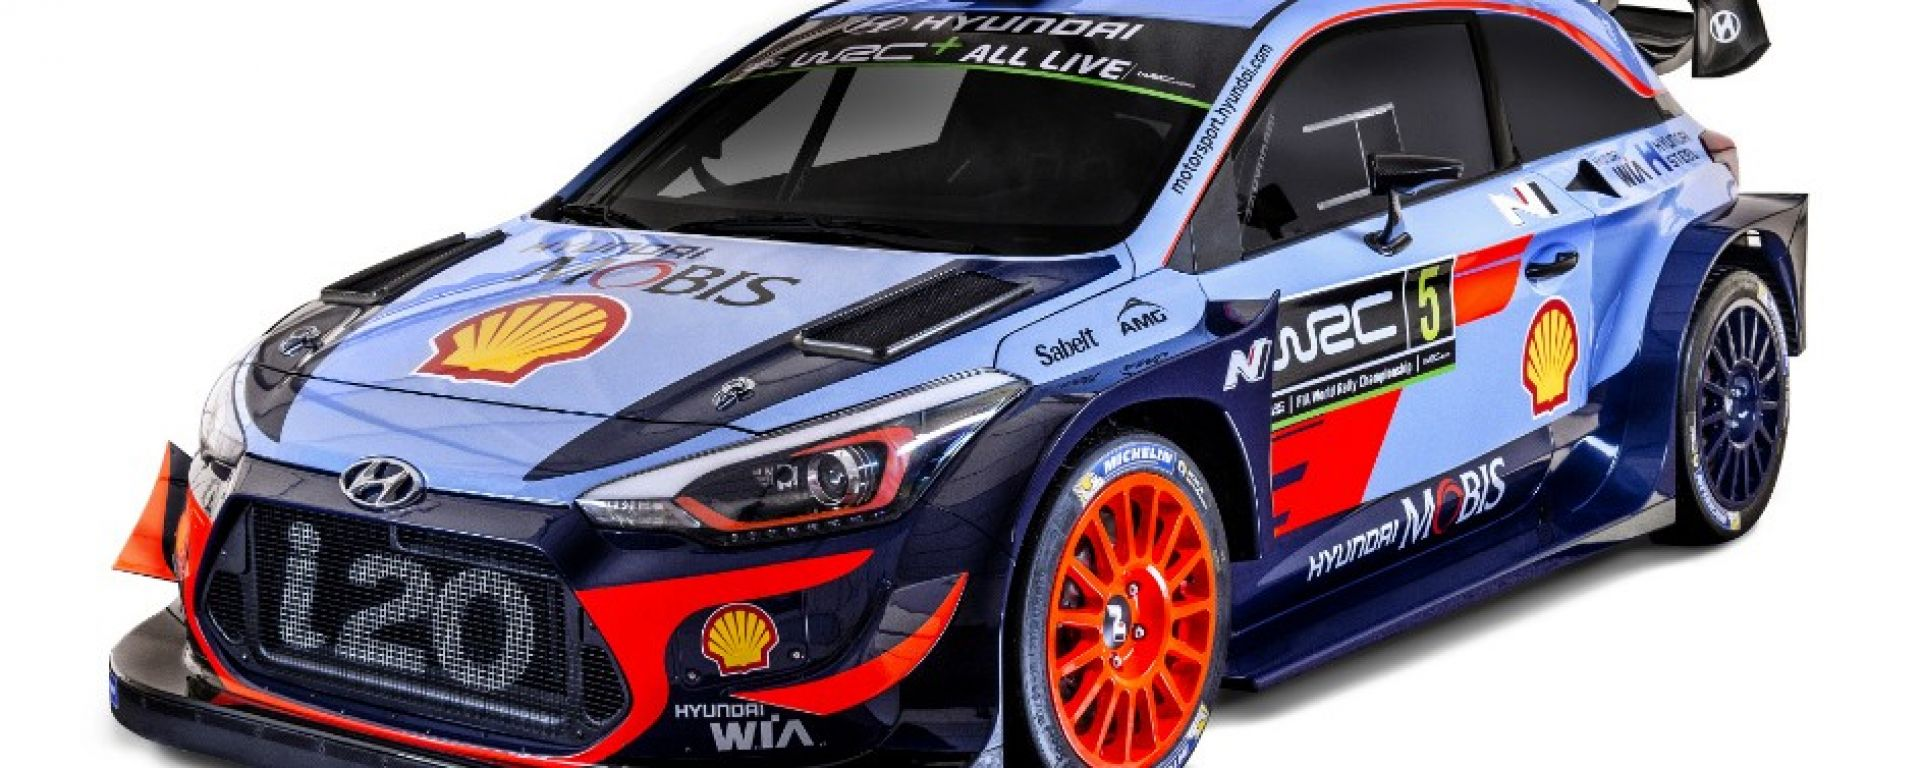 Hyundai World Rally Team WRC 2019